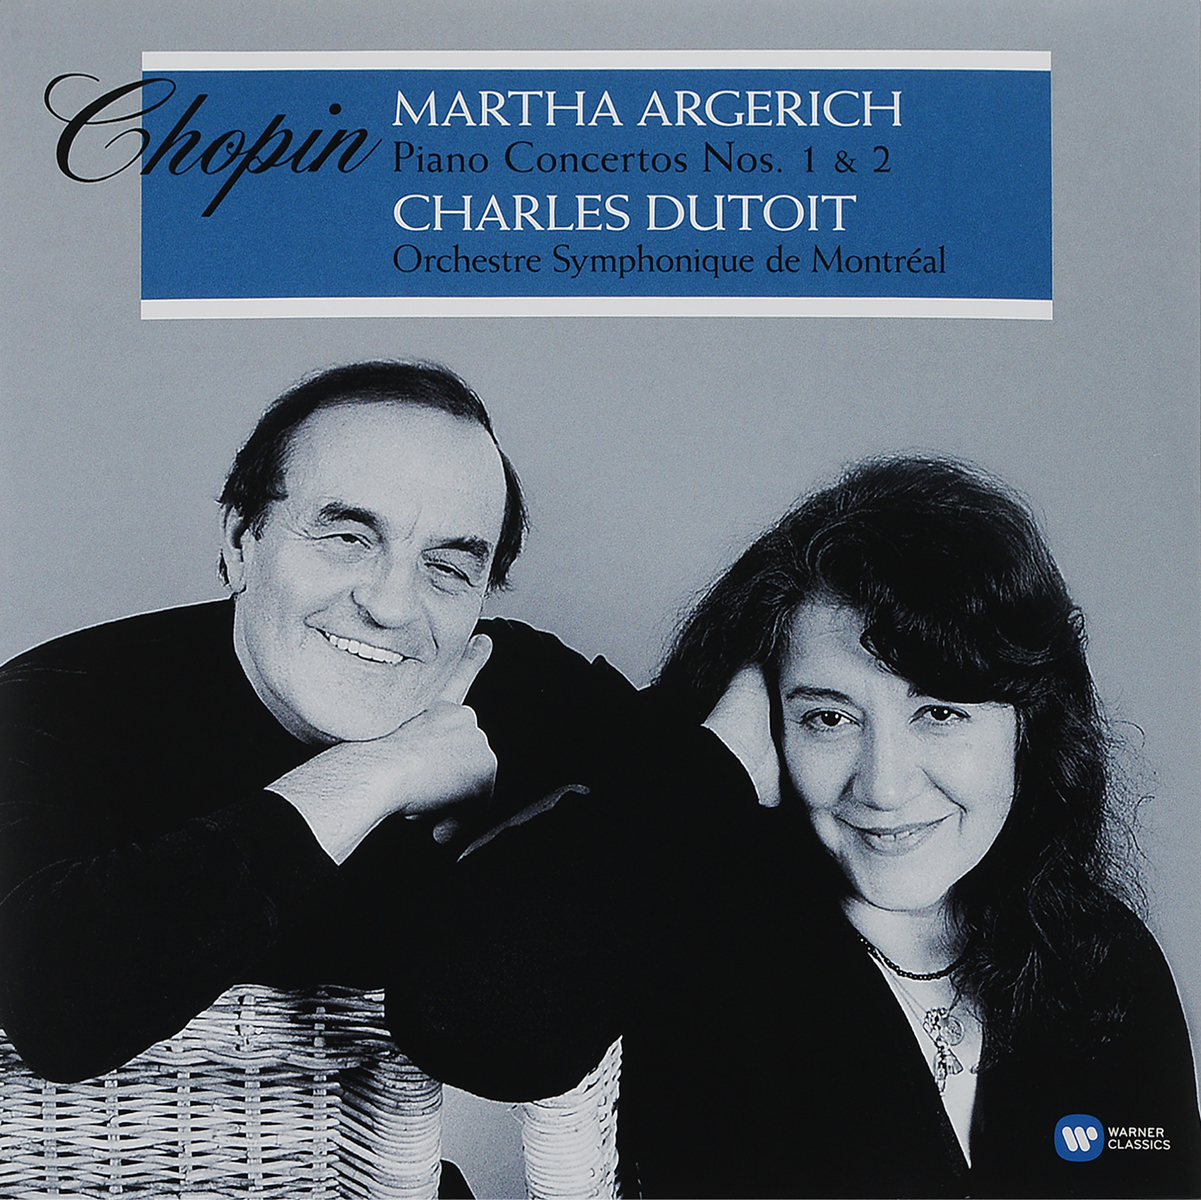 Martha Argerich, Charles Dutoit. Chopin. Piano Concertos Nos. 1 & 2 (2 LP)